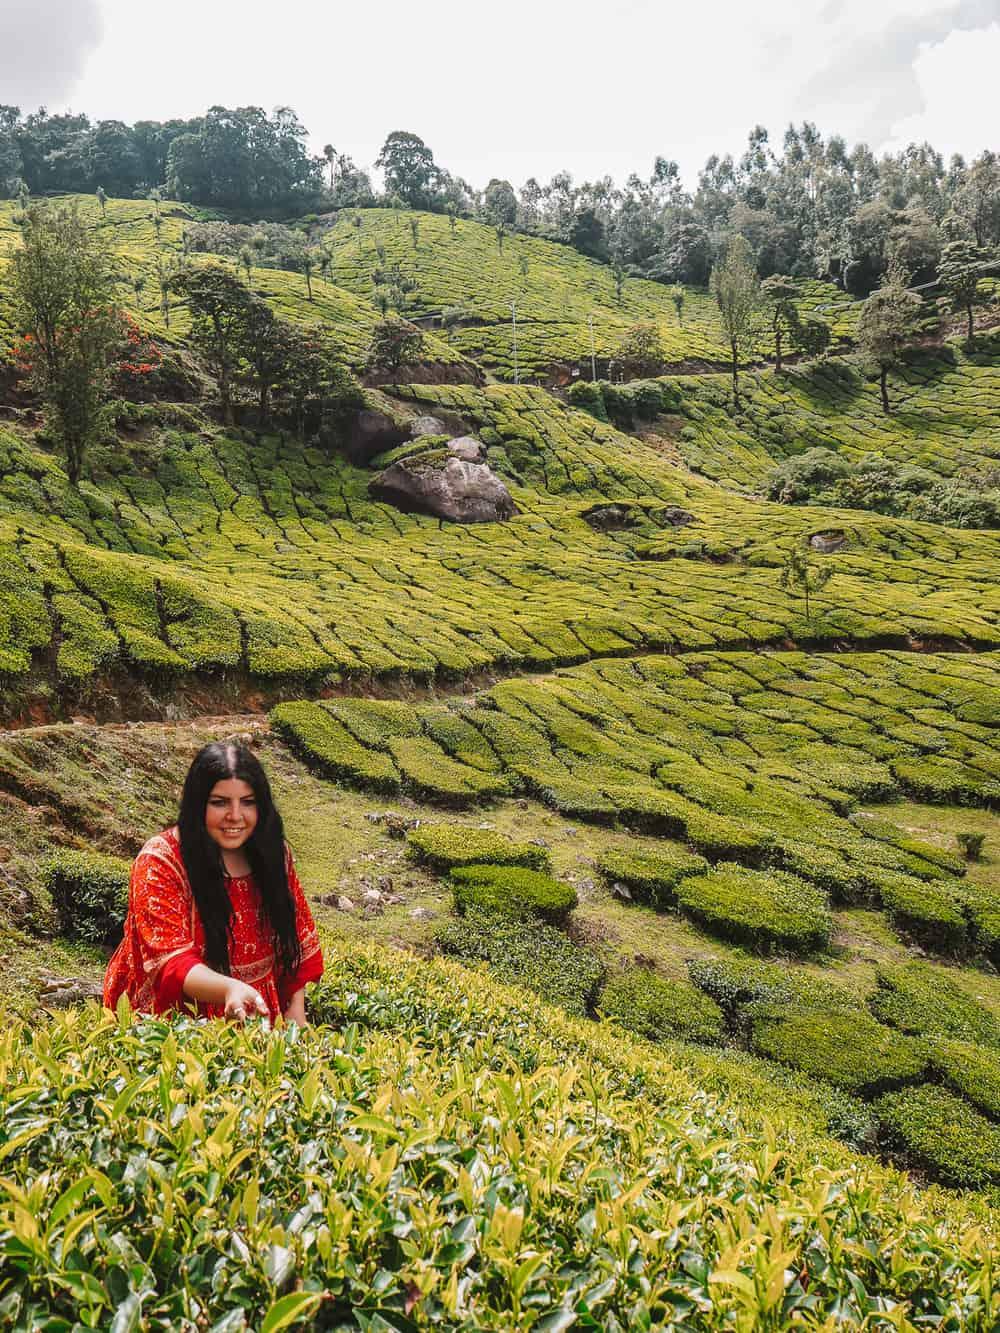 Things to do in Munnar | Tea plantations in Munnar